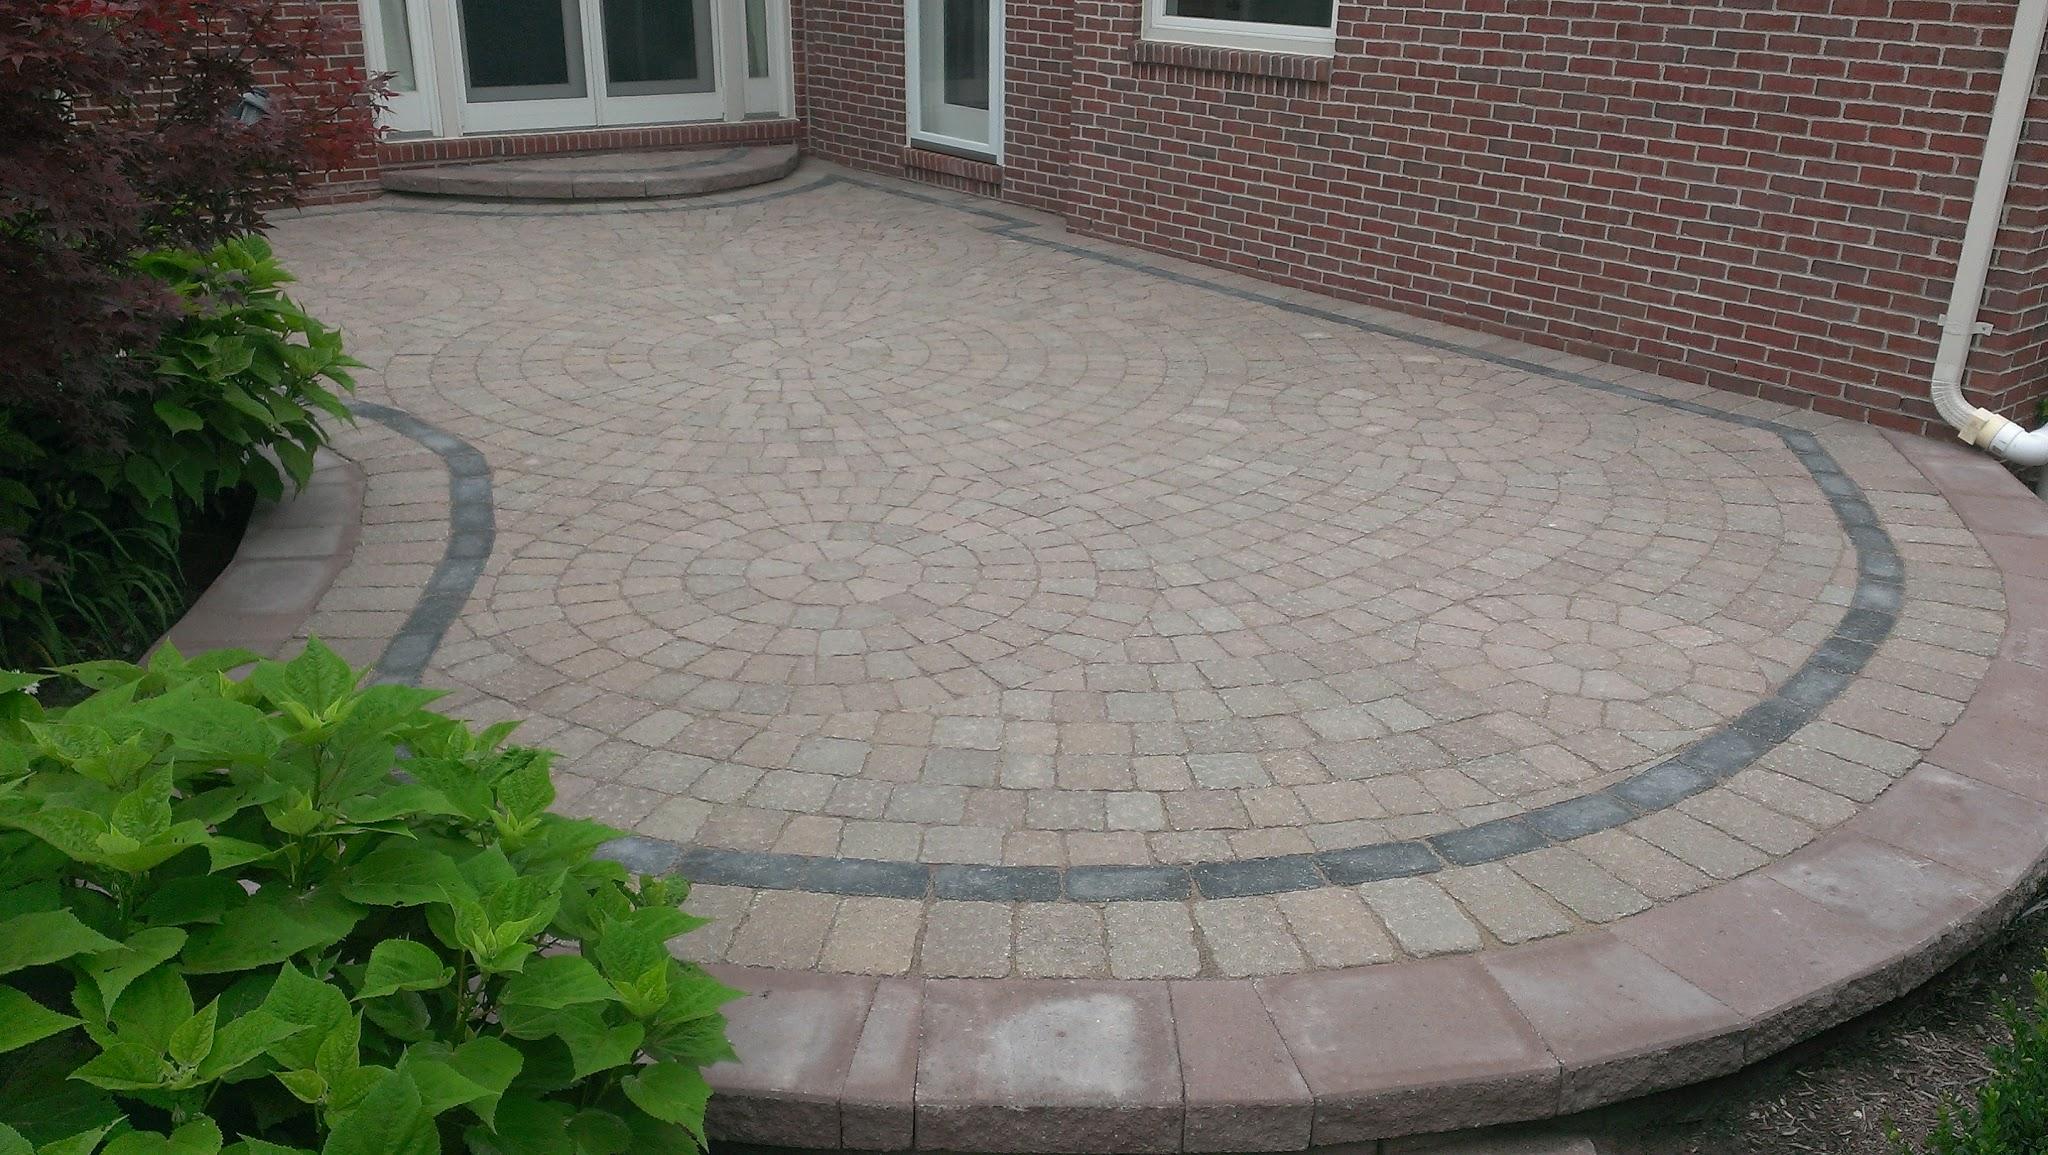 Cornerstone Brick Paving & Landscape image 10